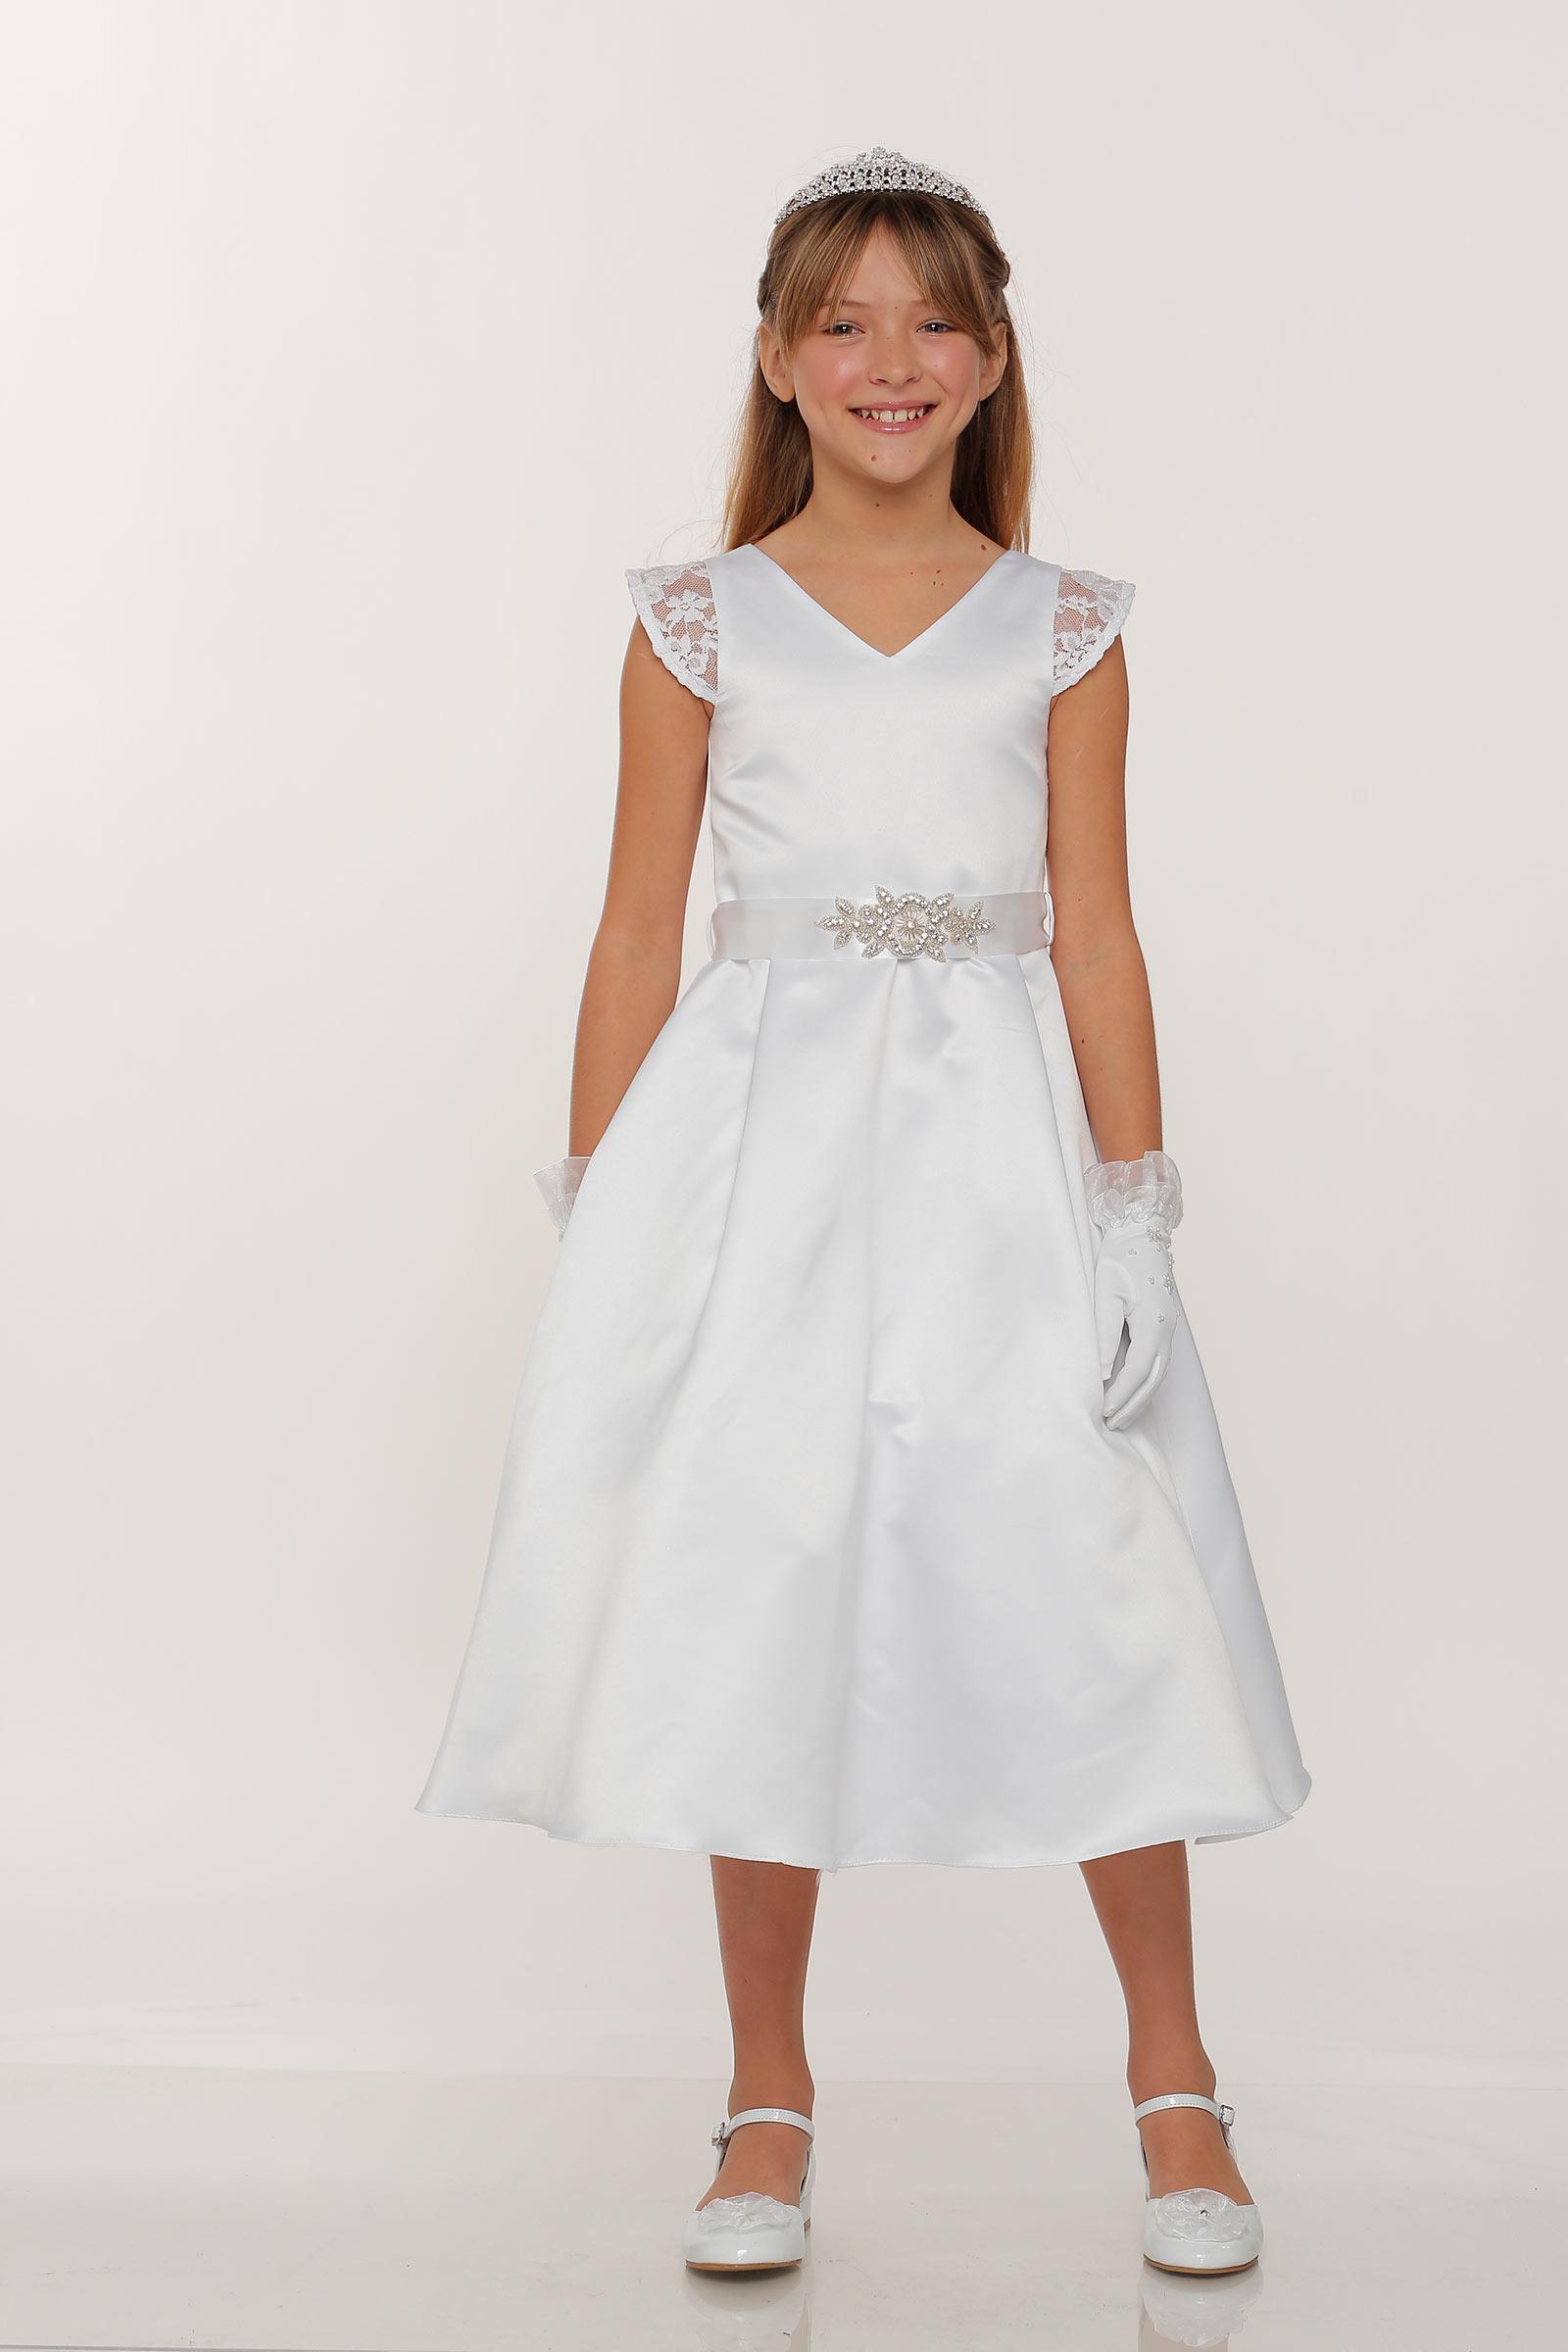 Cc 2009 Girls Dress Style 2009 White Cap Sleeve Satin